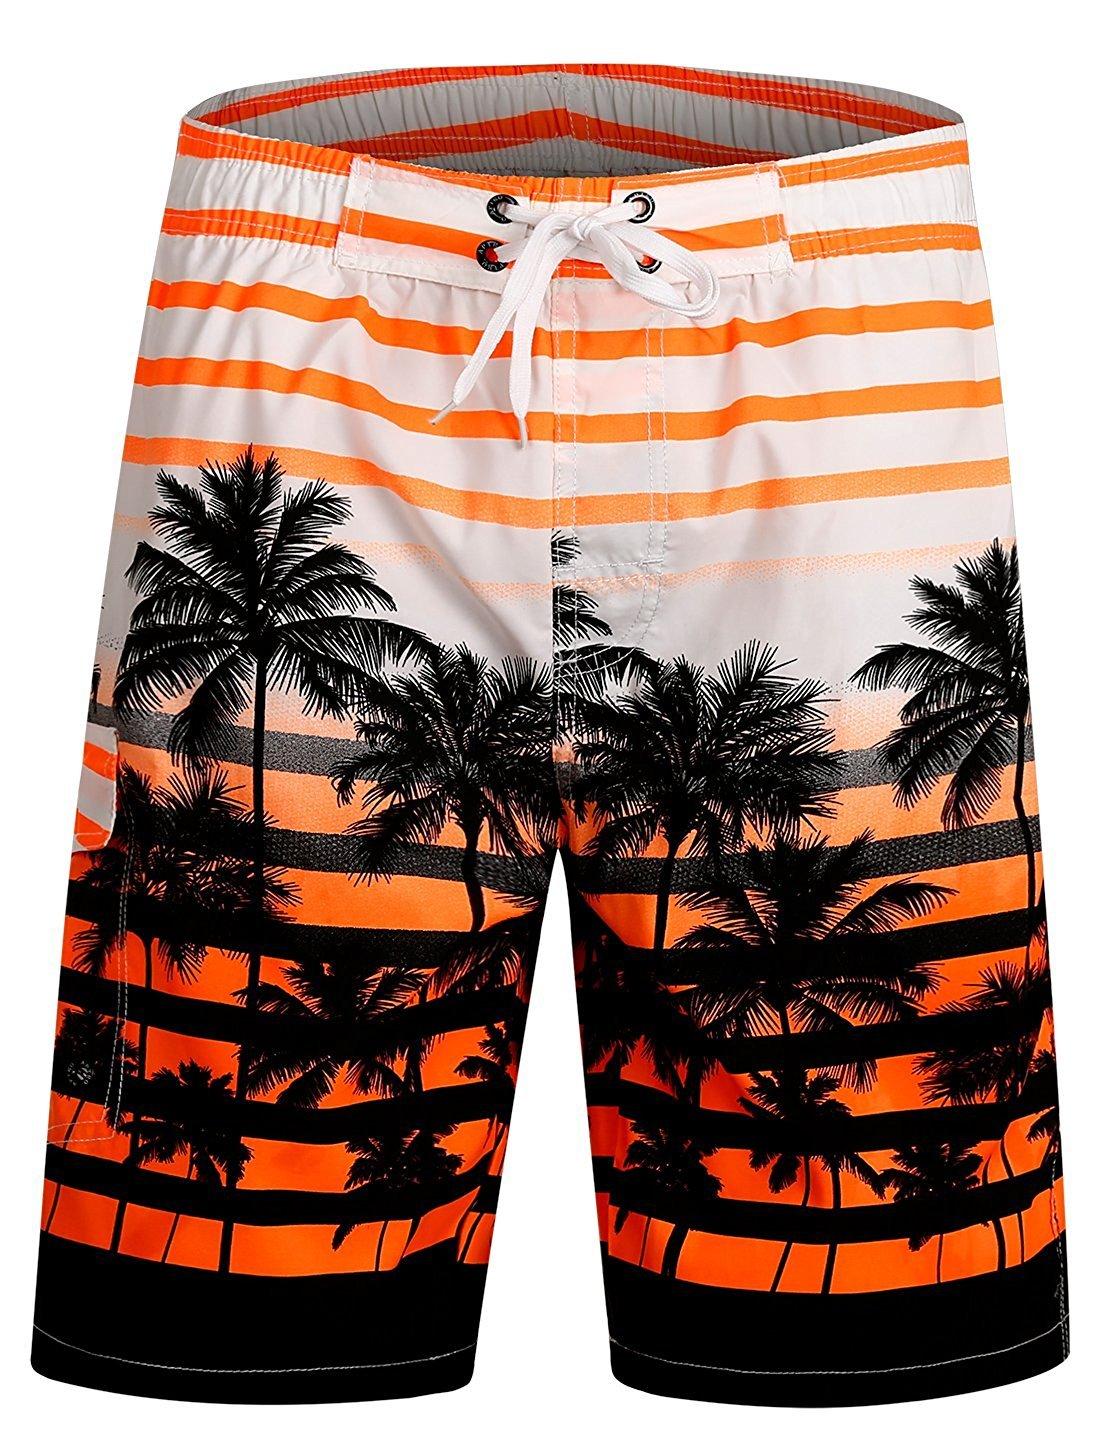 ICEbear Mens Swim Trunks Quick Dry Water Beach Board Shorts Cool Sportwear,Orange,2XL